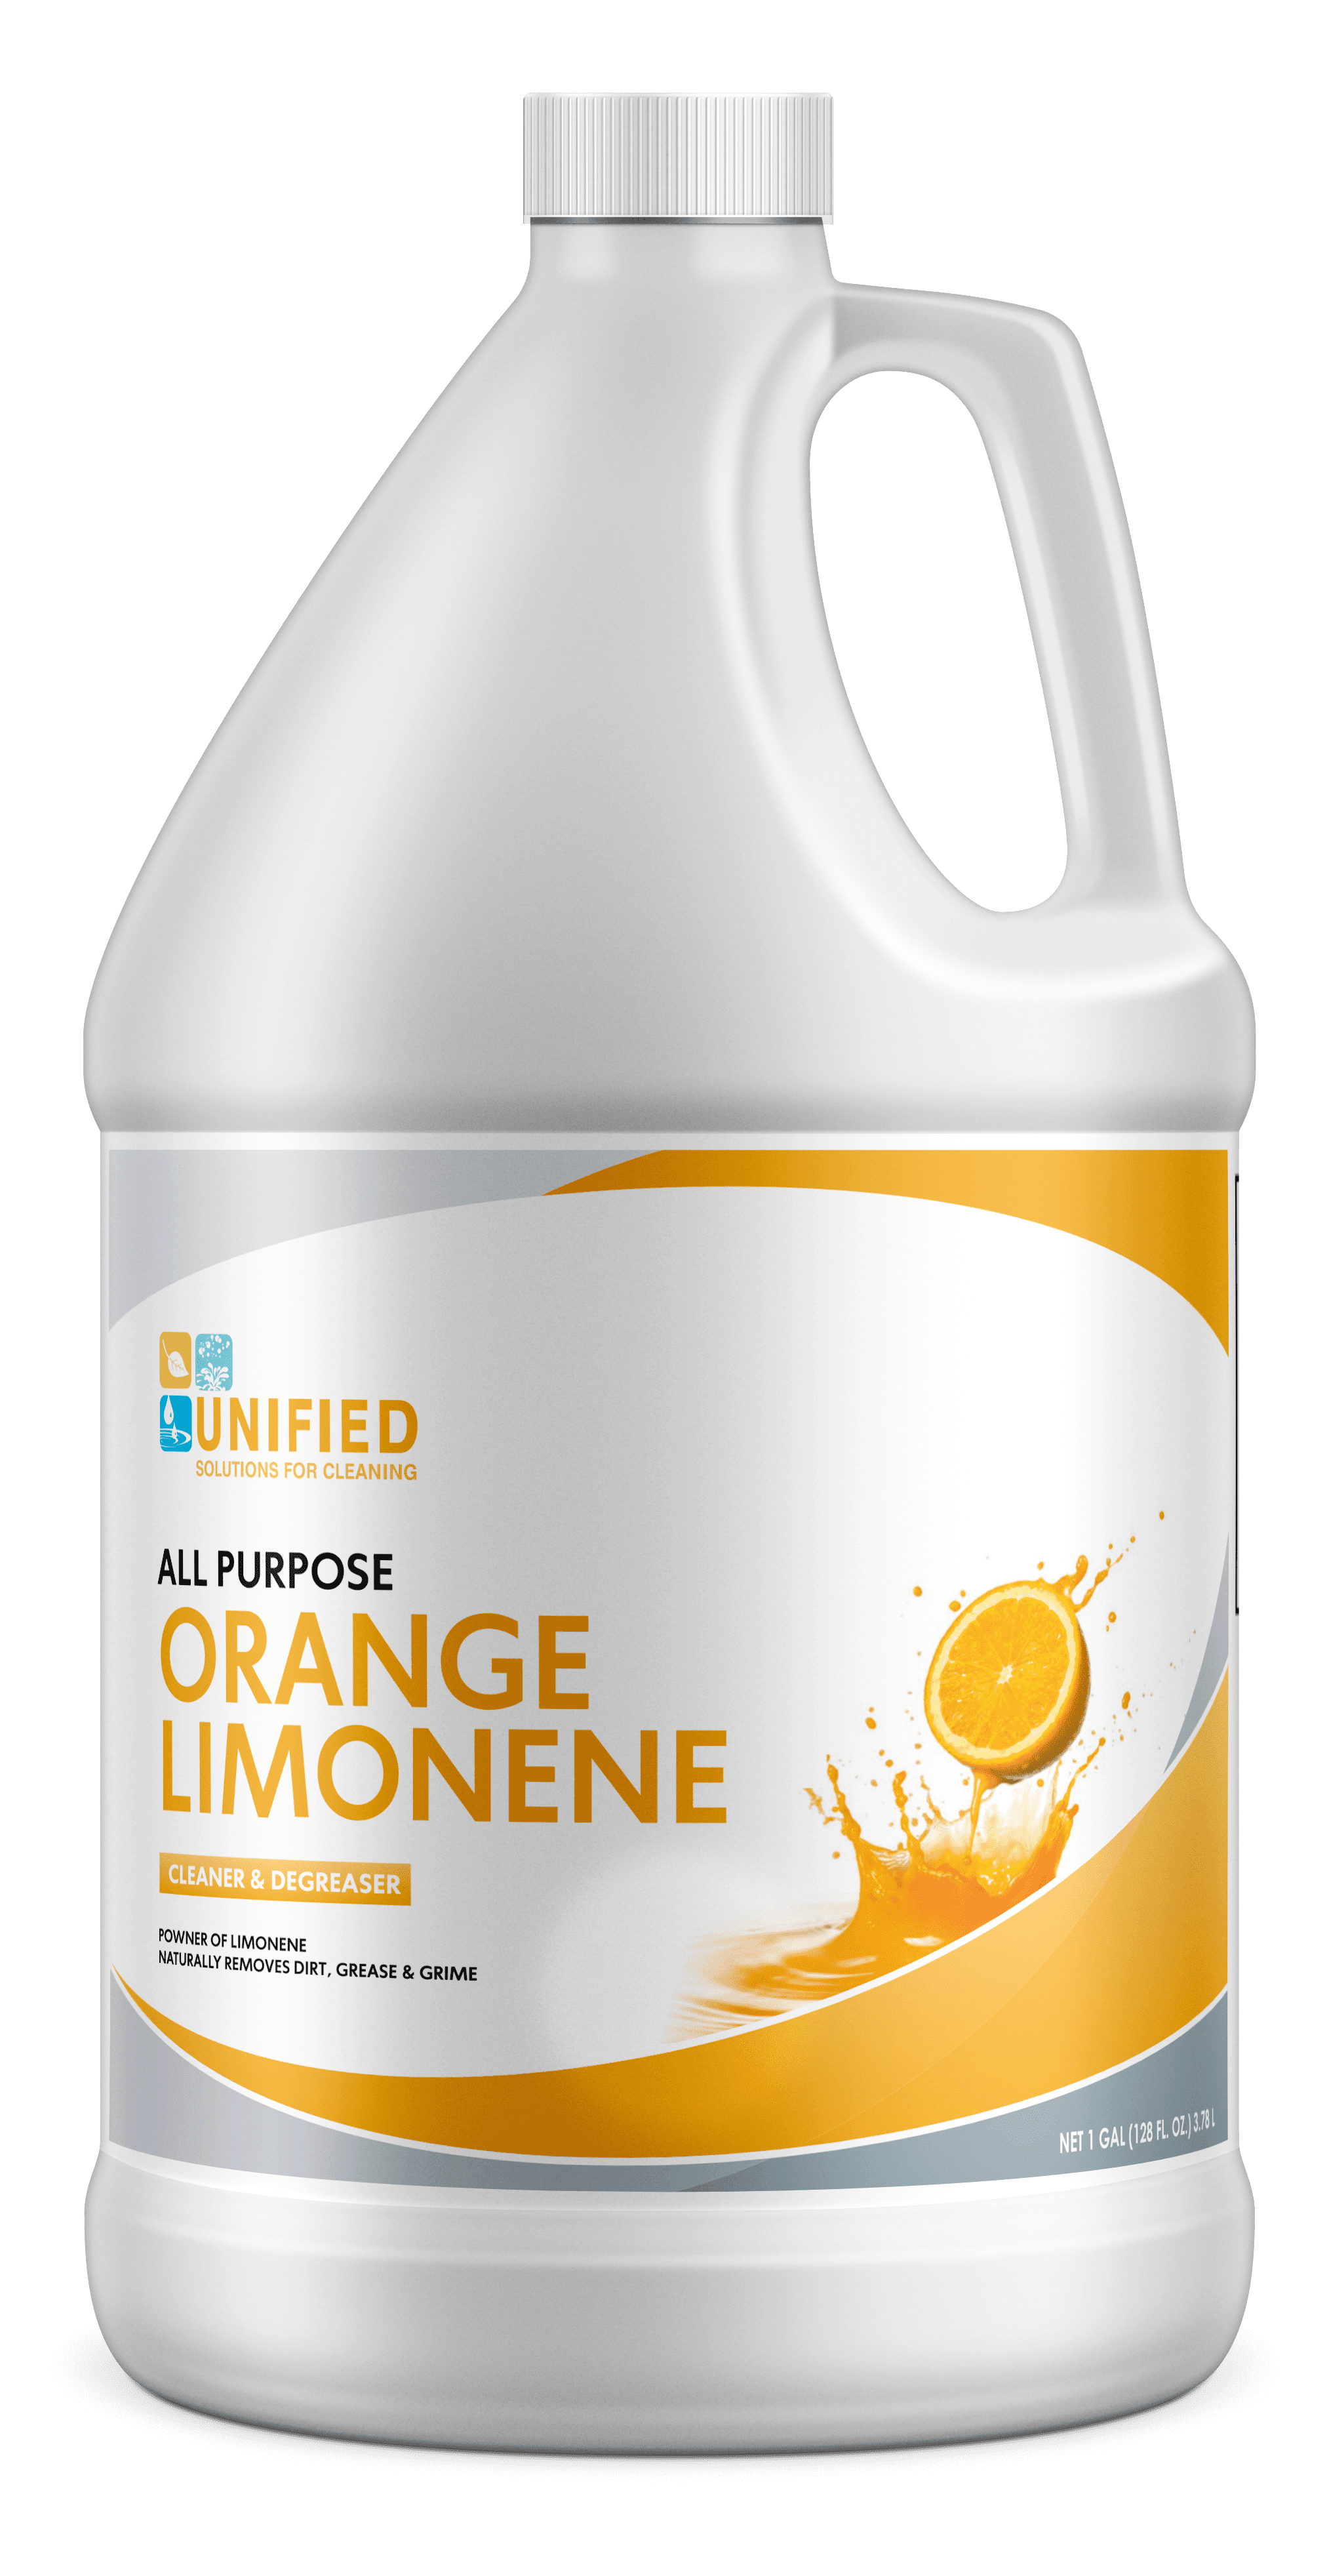 Unified_Orange_Limonene